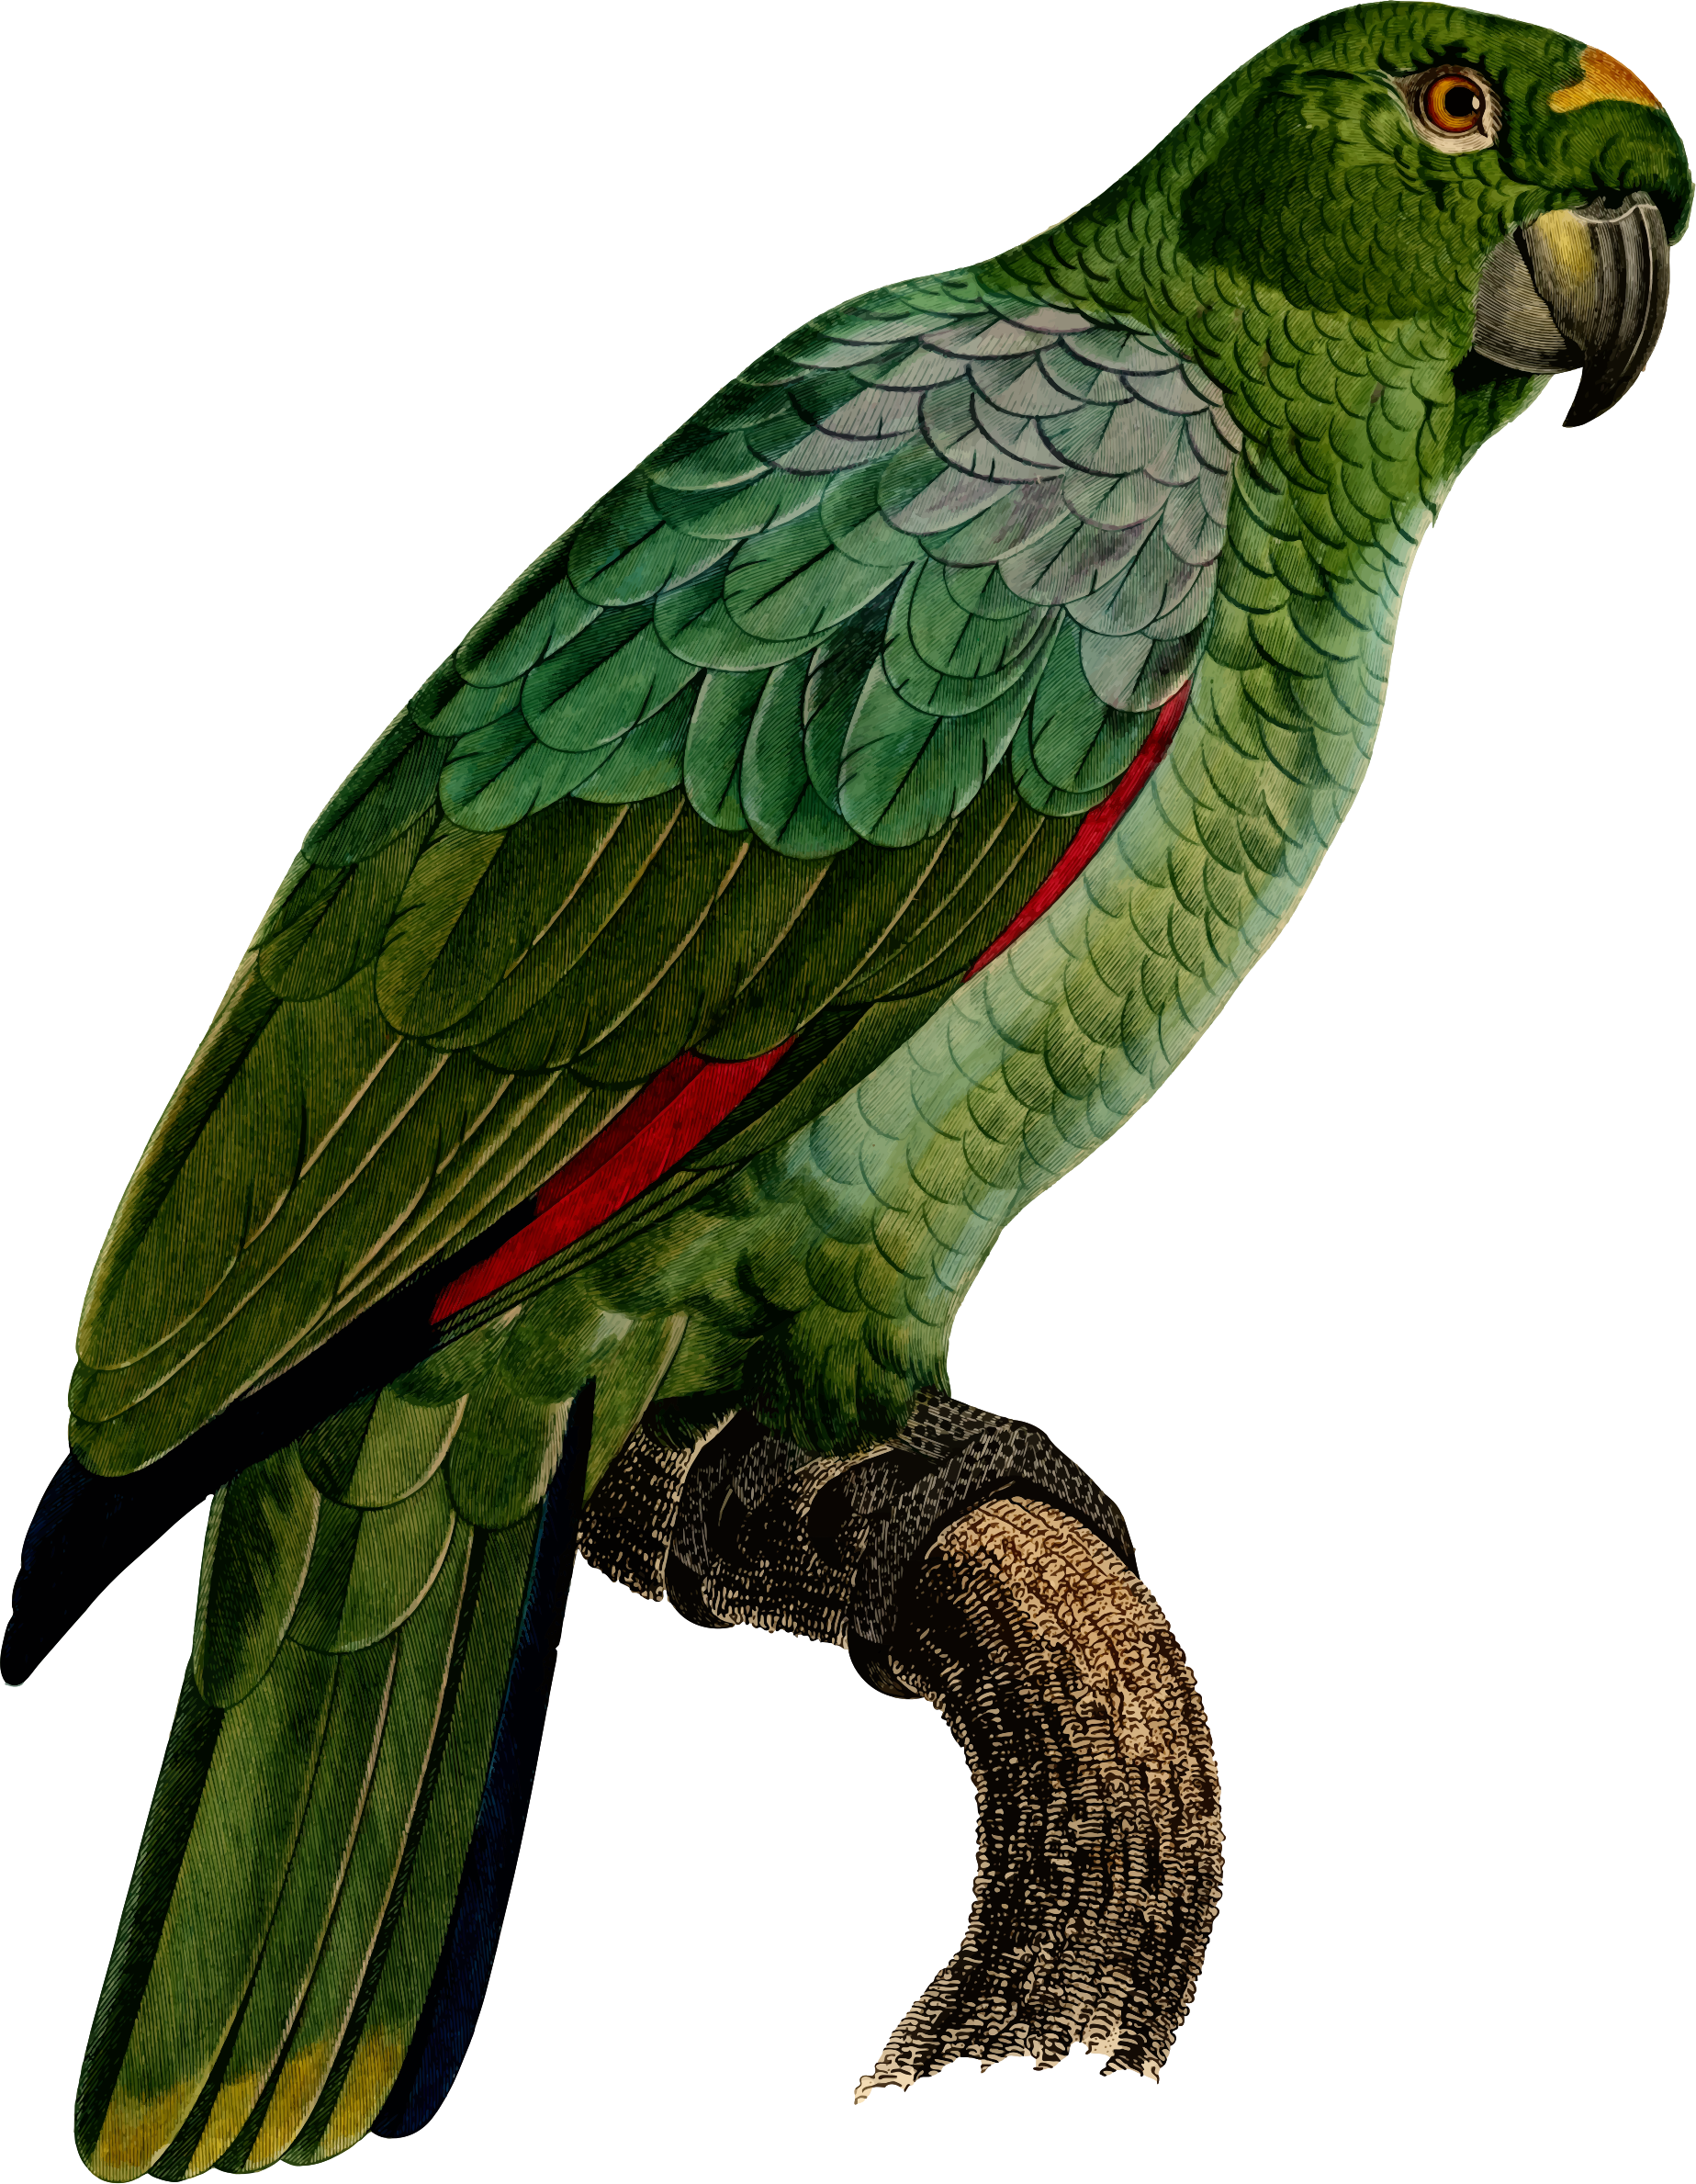 Big image png. Parrot clipart budgie